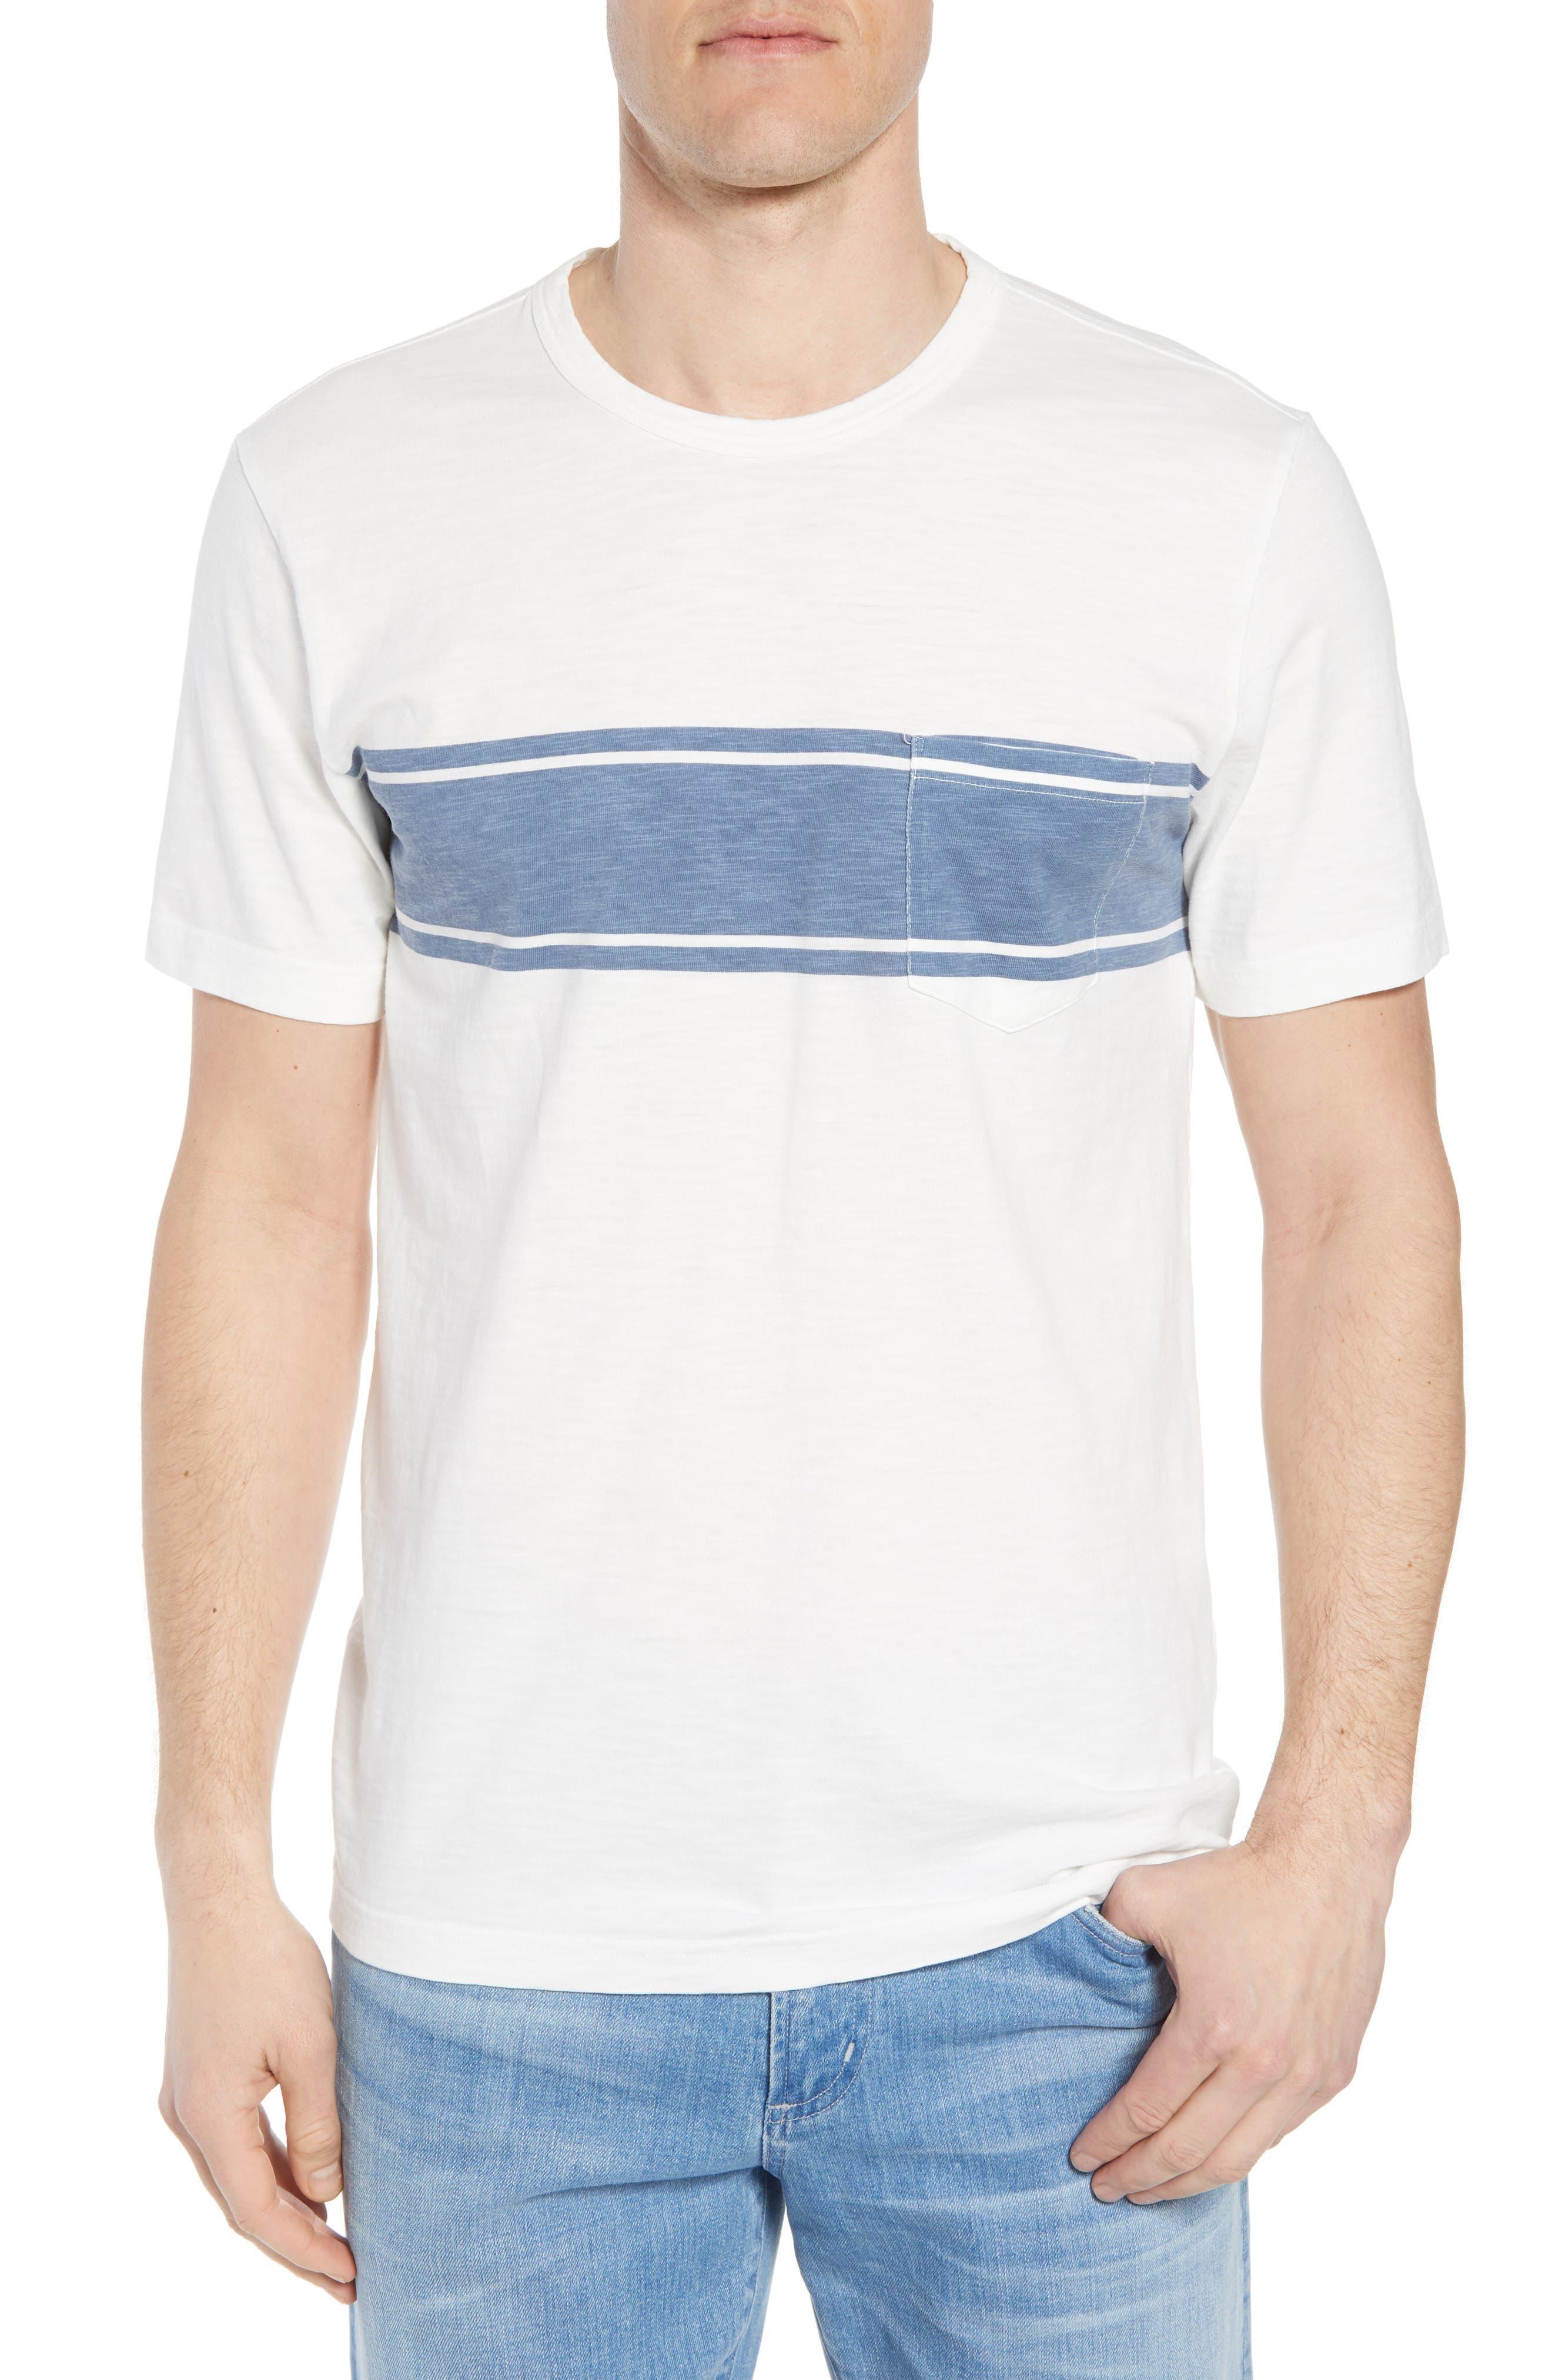 Surf Stripe Pocket T-Shirt,                             Main thumbnail 1, color,                             WHITE SURF STRIPE